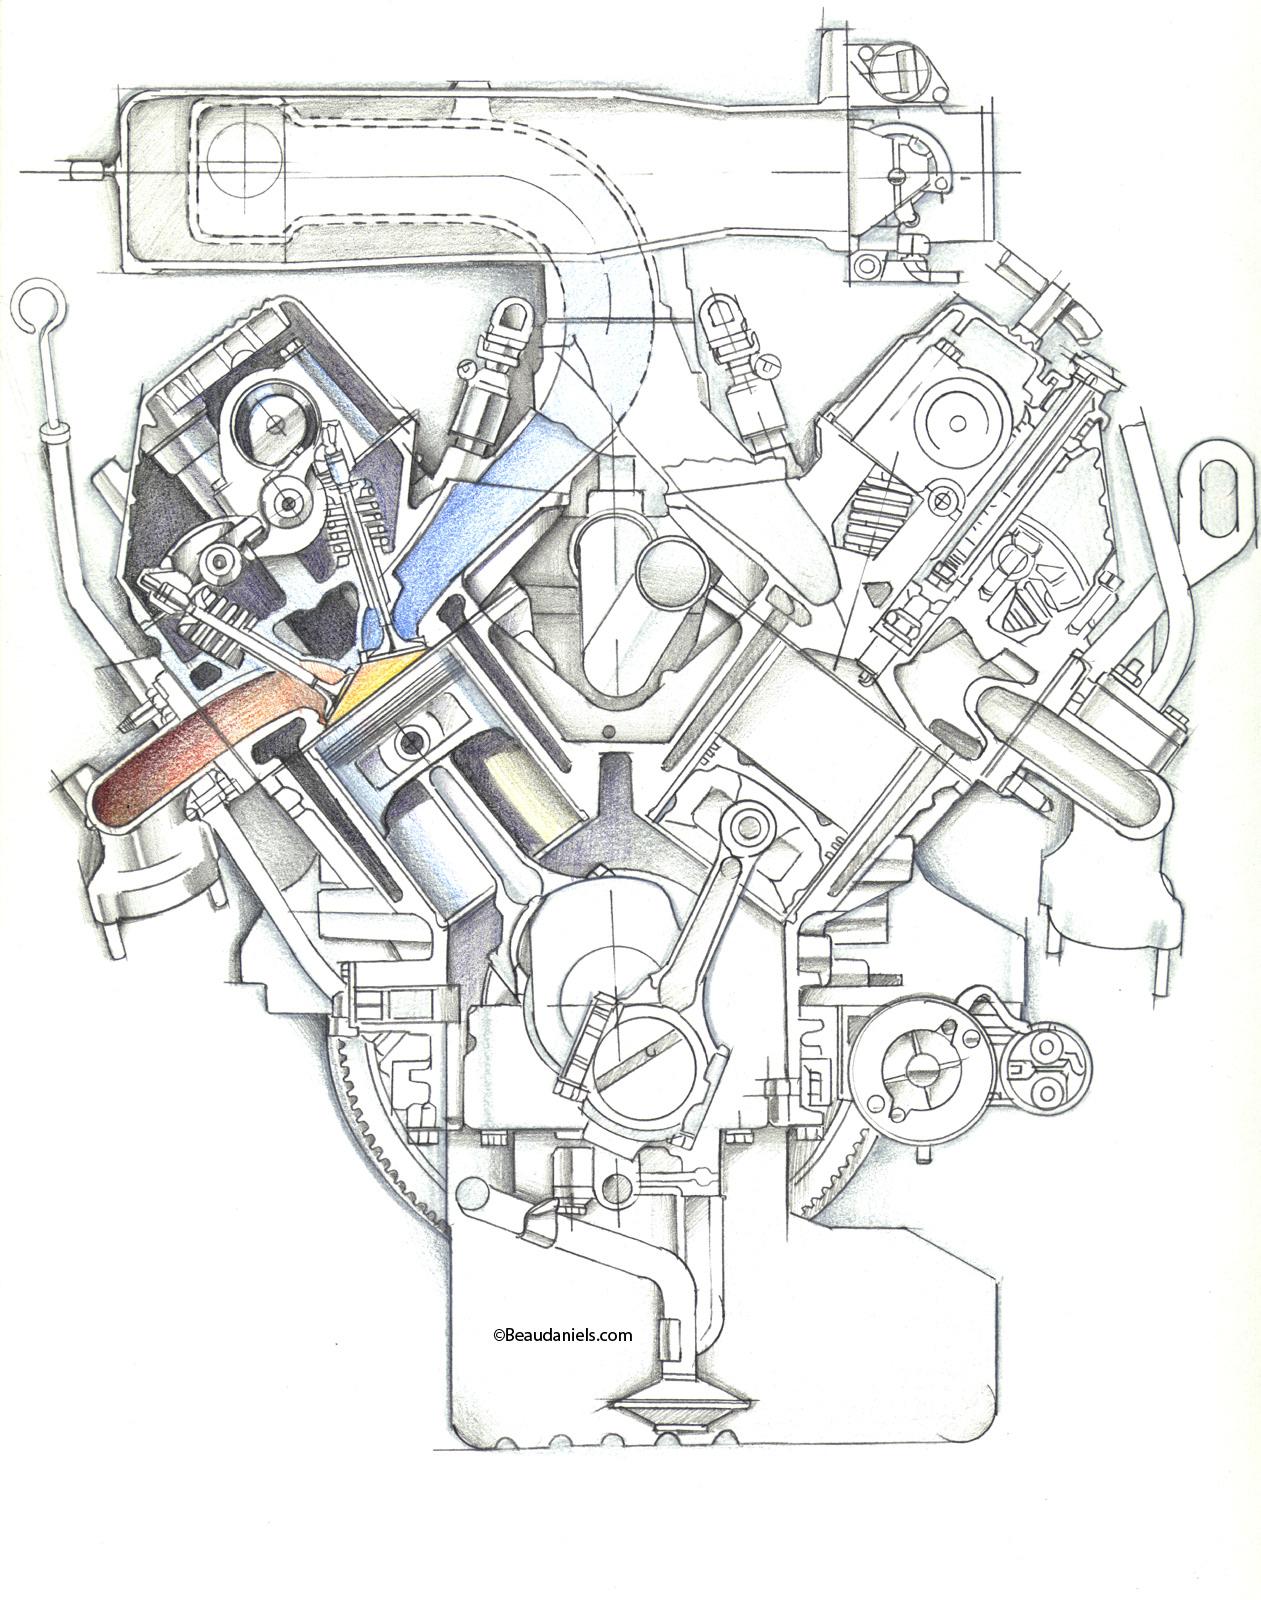 Technical Illustration Beau And Alan Daniels Cutaway